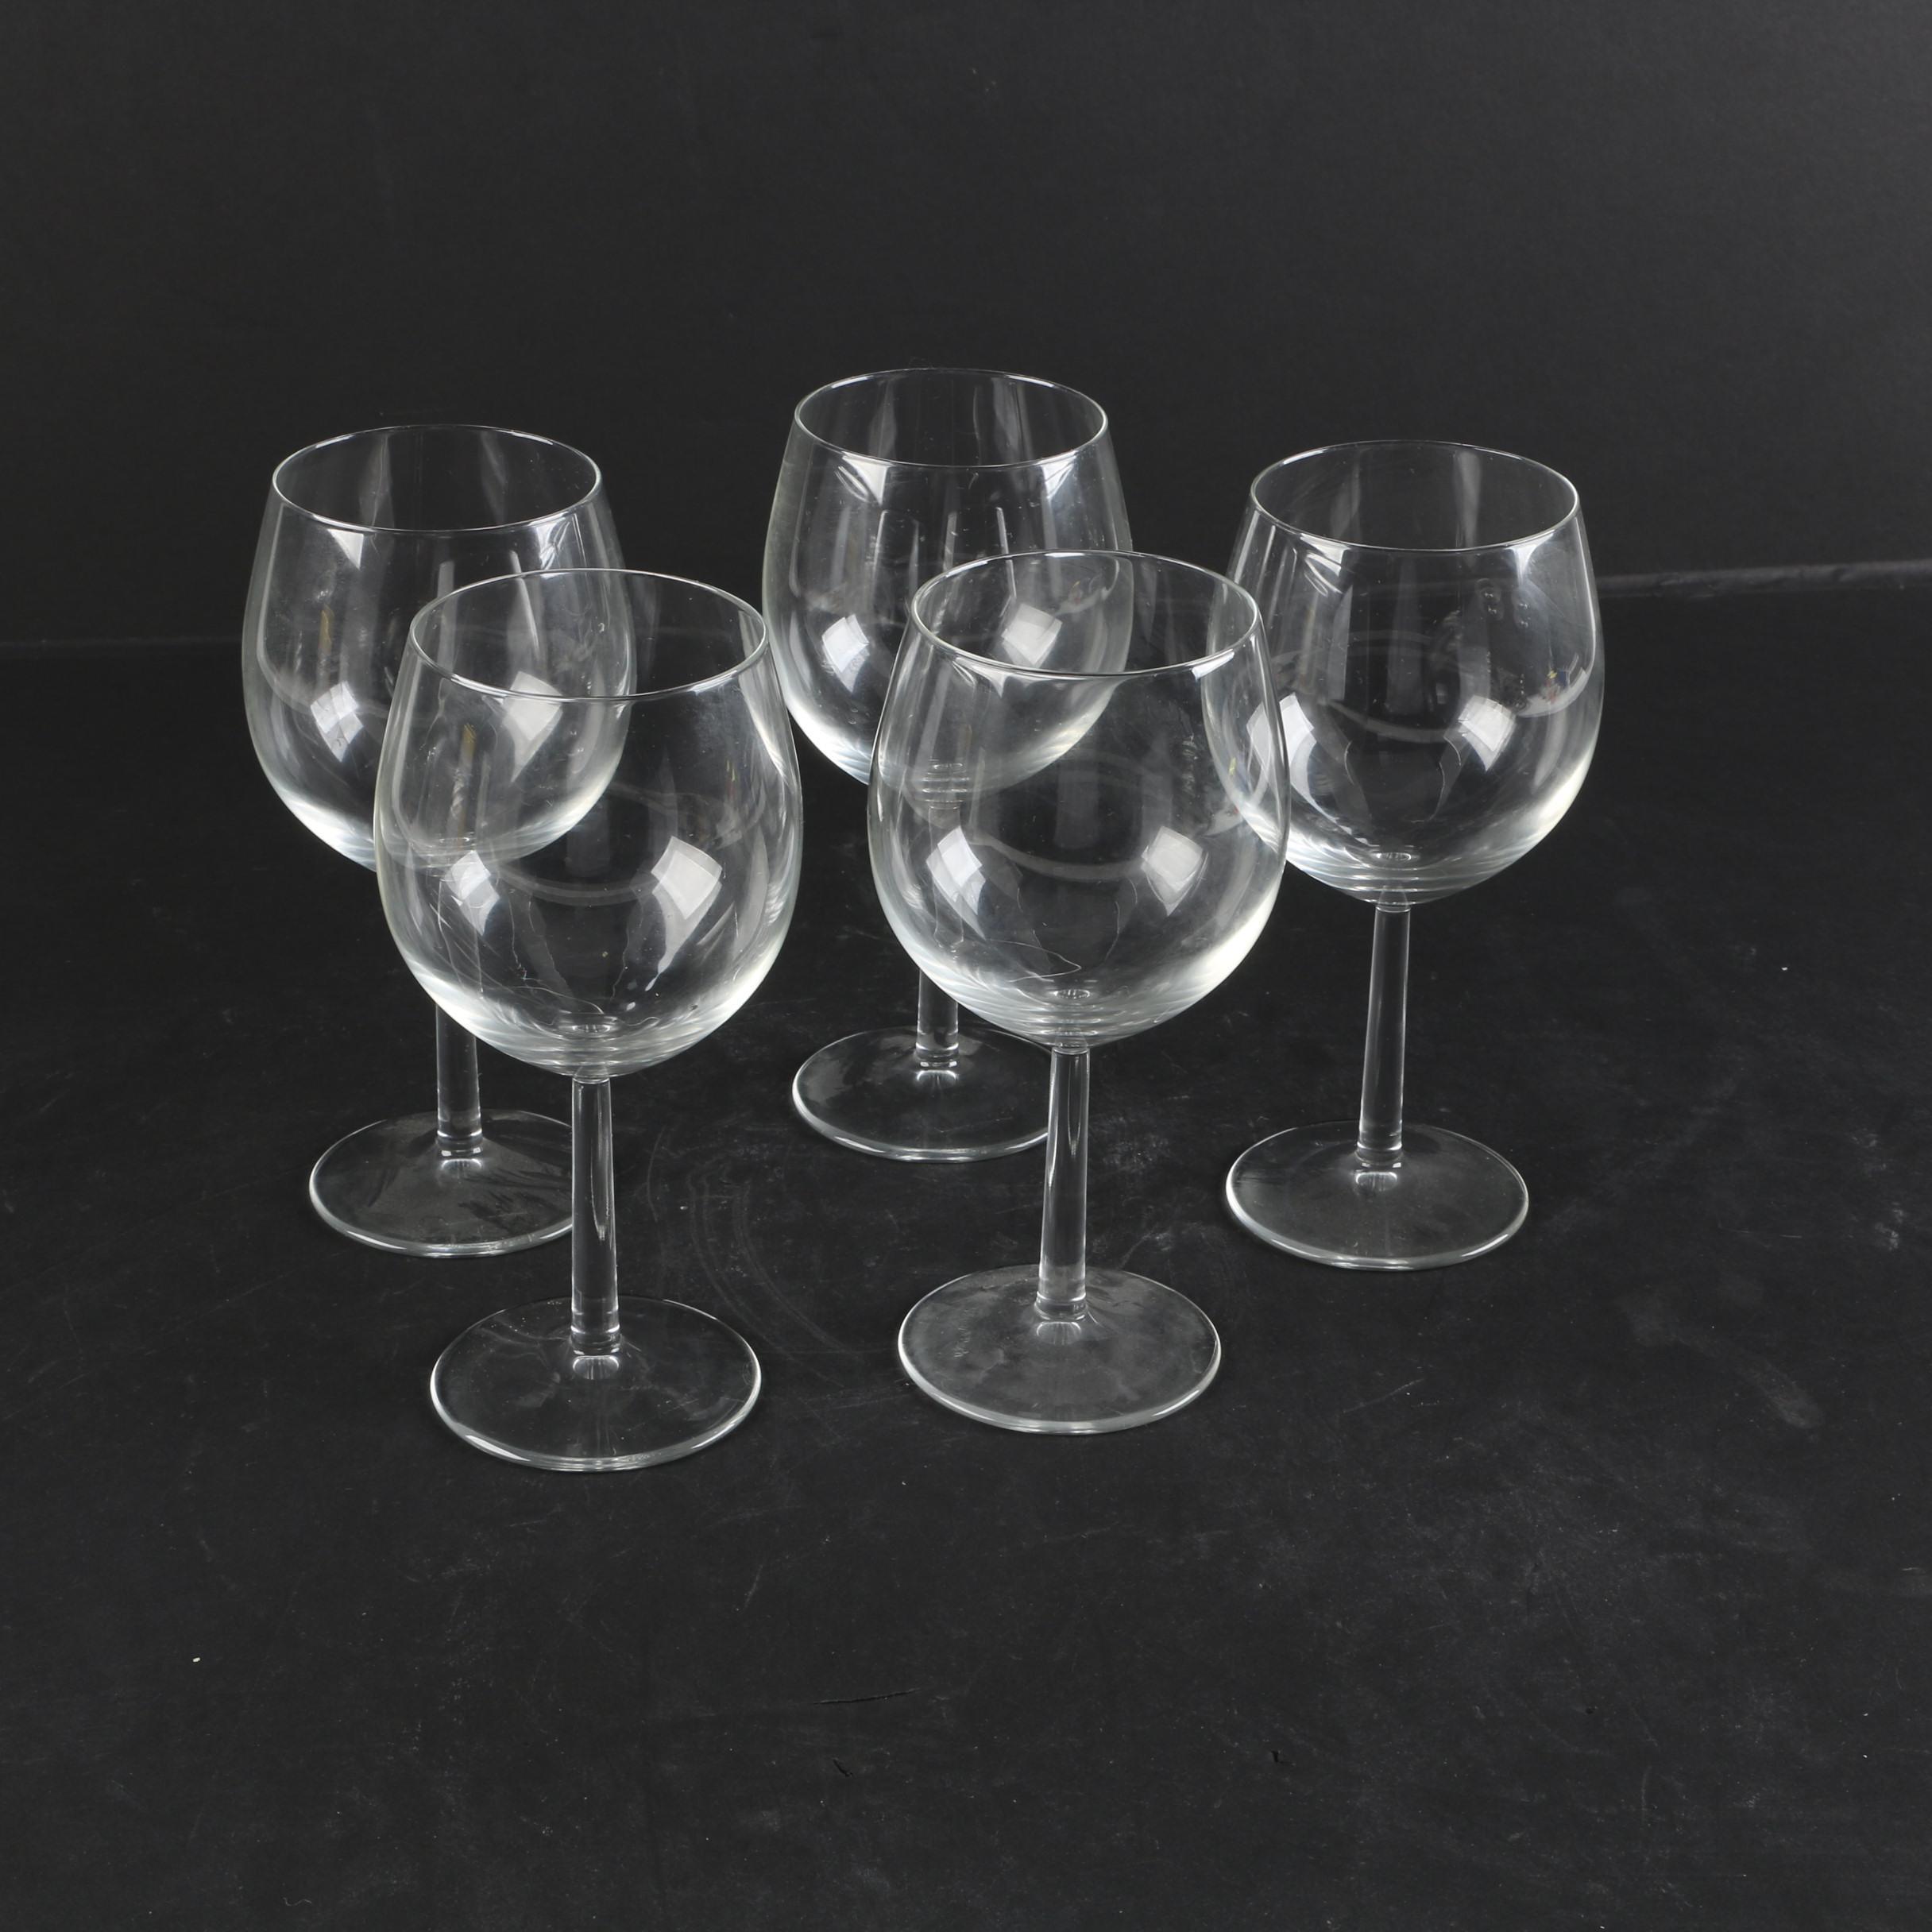 Villeroy & Boch Wine Glasses